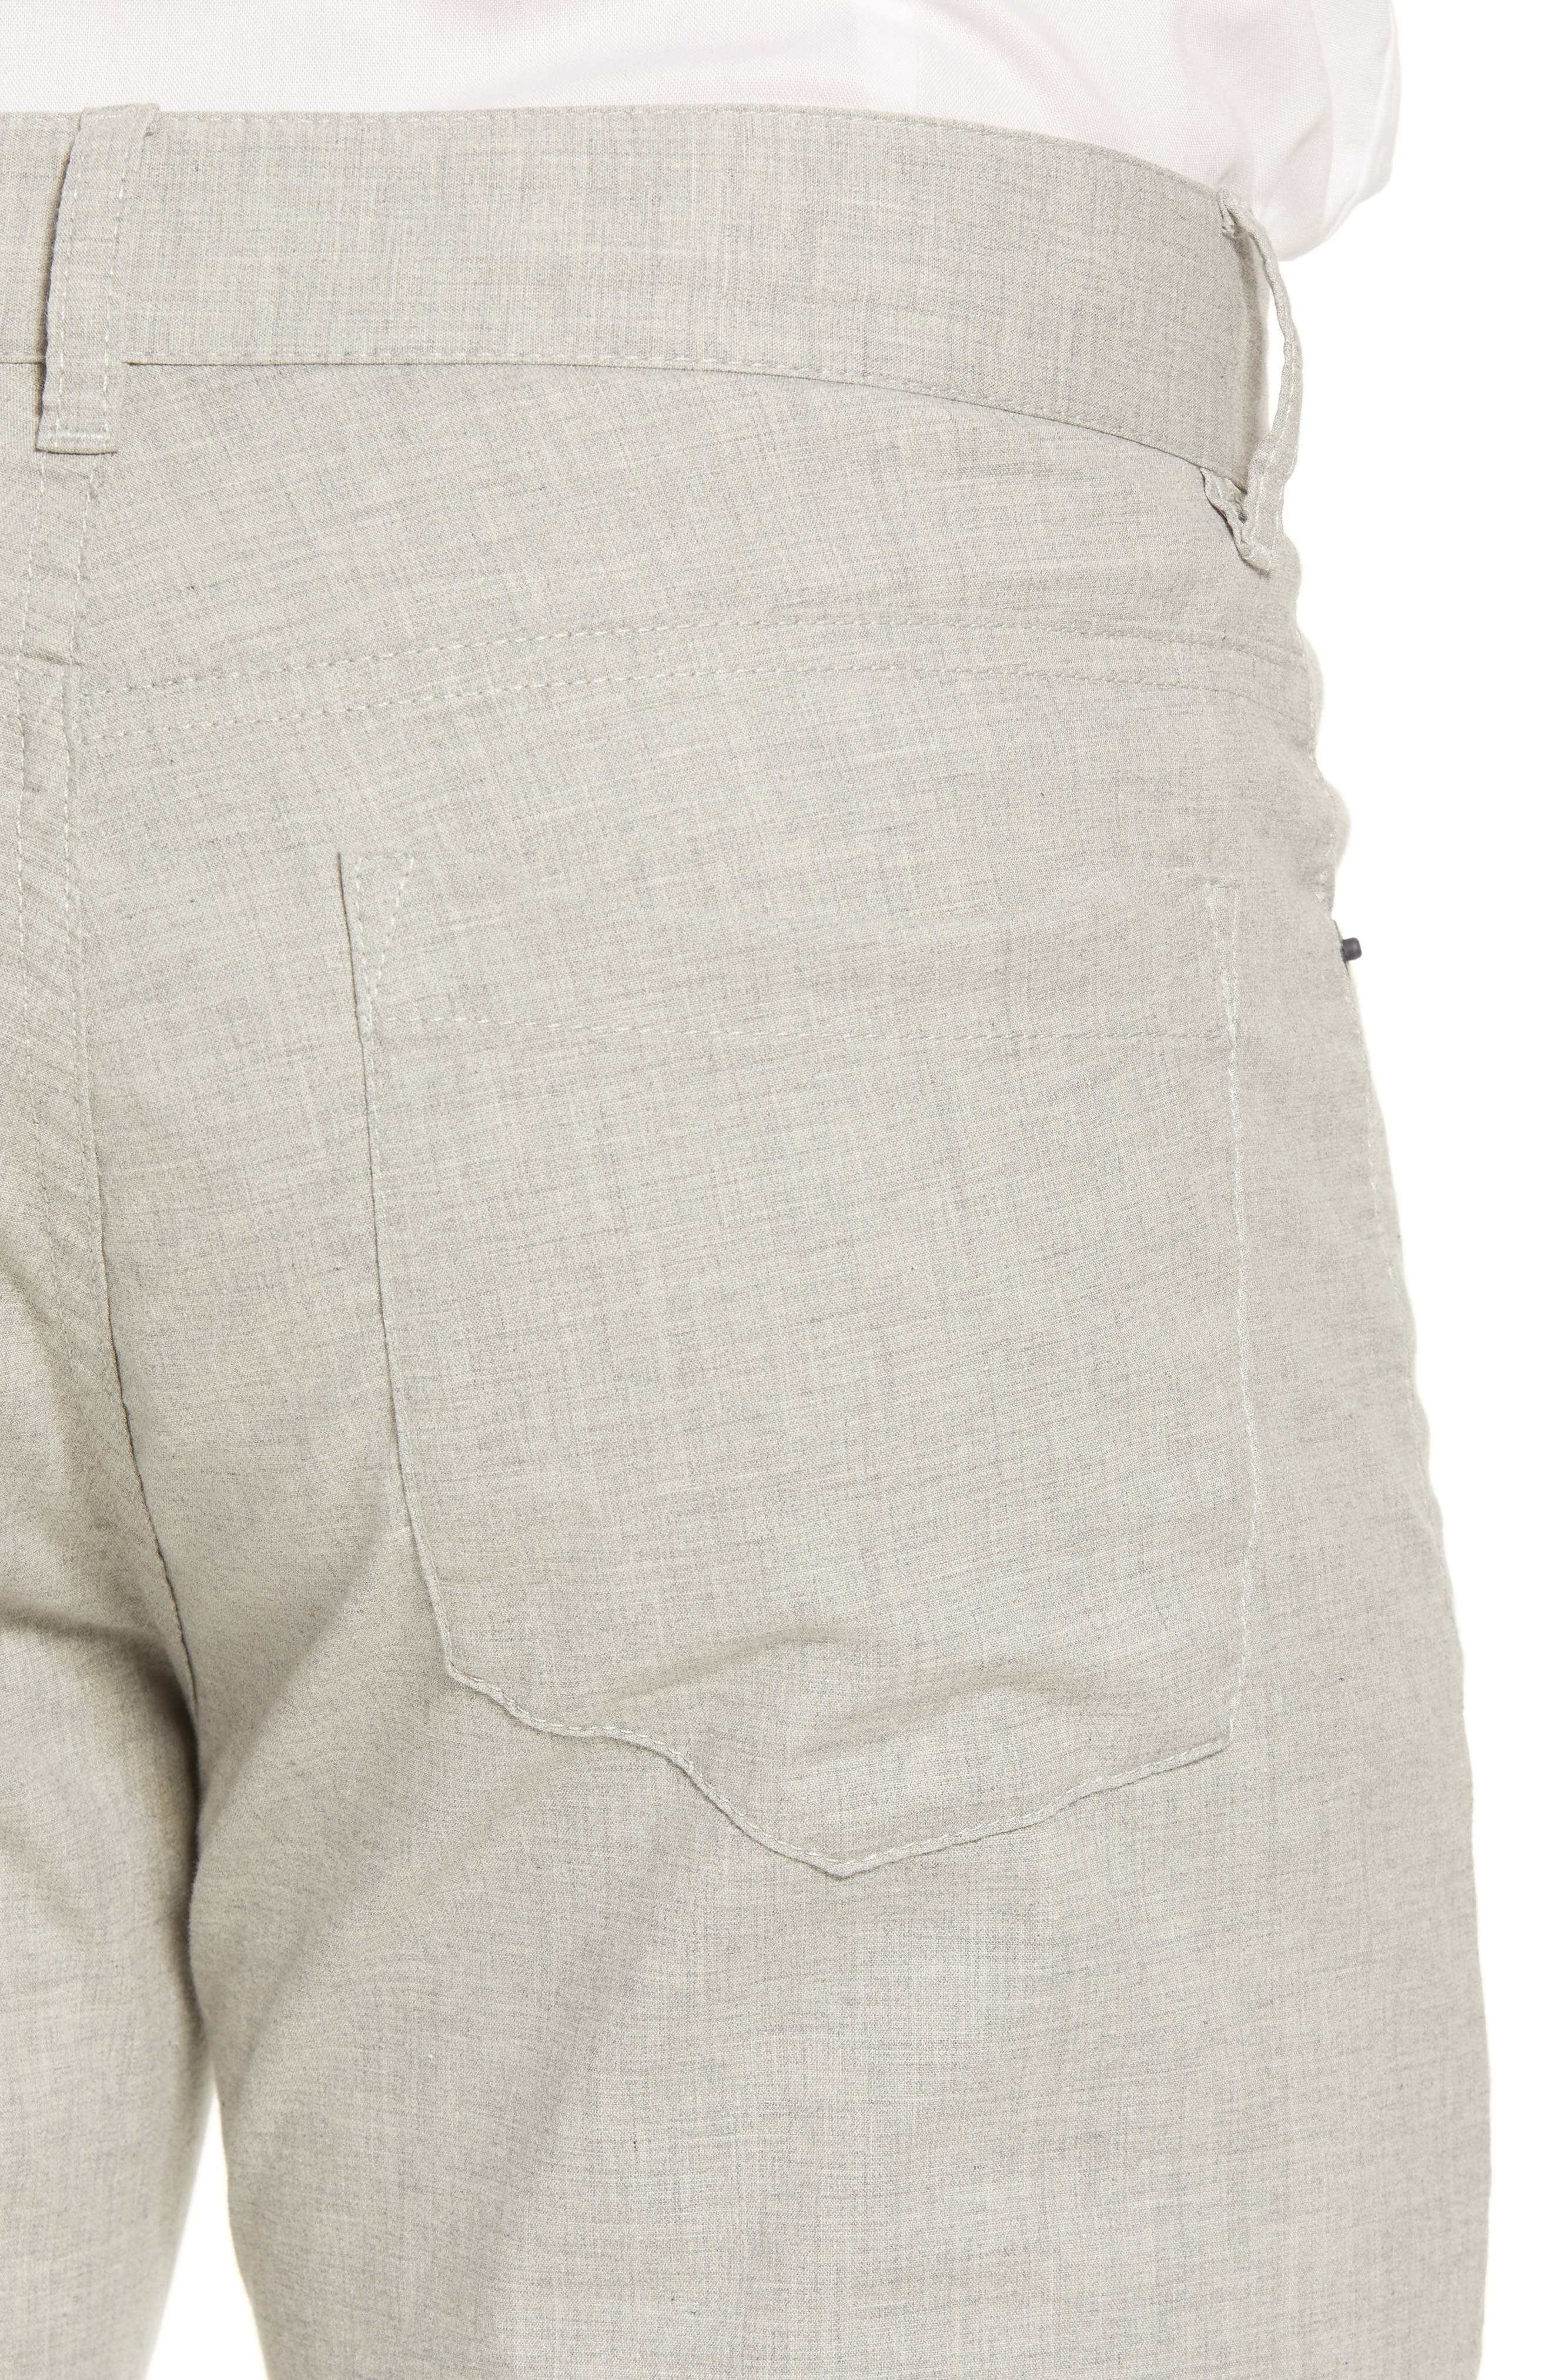 McKinney Regular Fit Straight Leg Pants,                             Alternate thumbnail 4, color,                             GREY